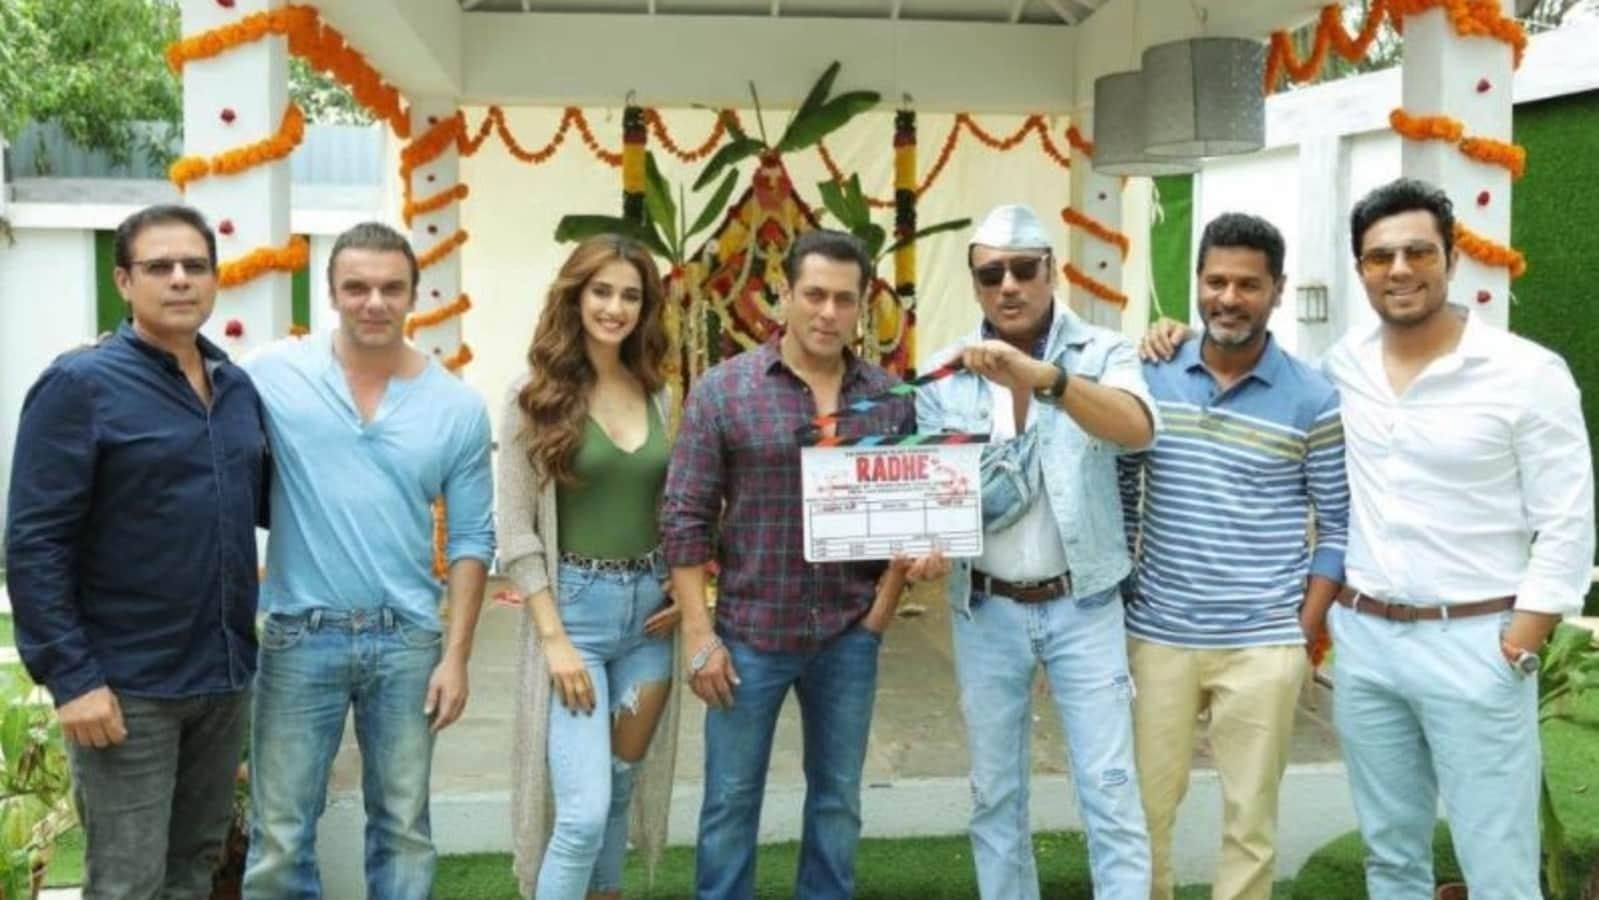 Tiger Shroff praises rumoured girlfriend Disha Patani in Radhe Your Most  Wanted Bhai's trailer: 'Looking great'   Hindustan Times